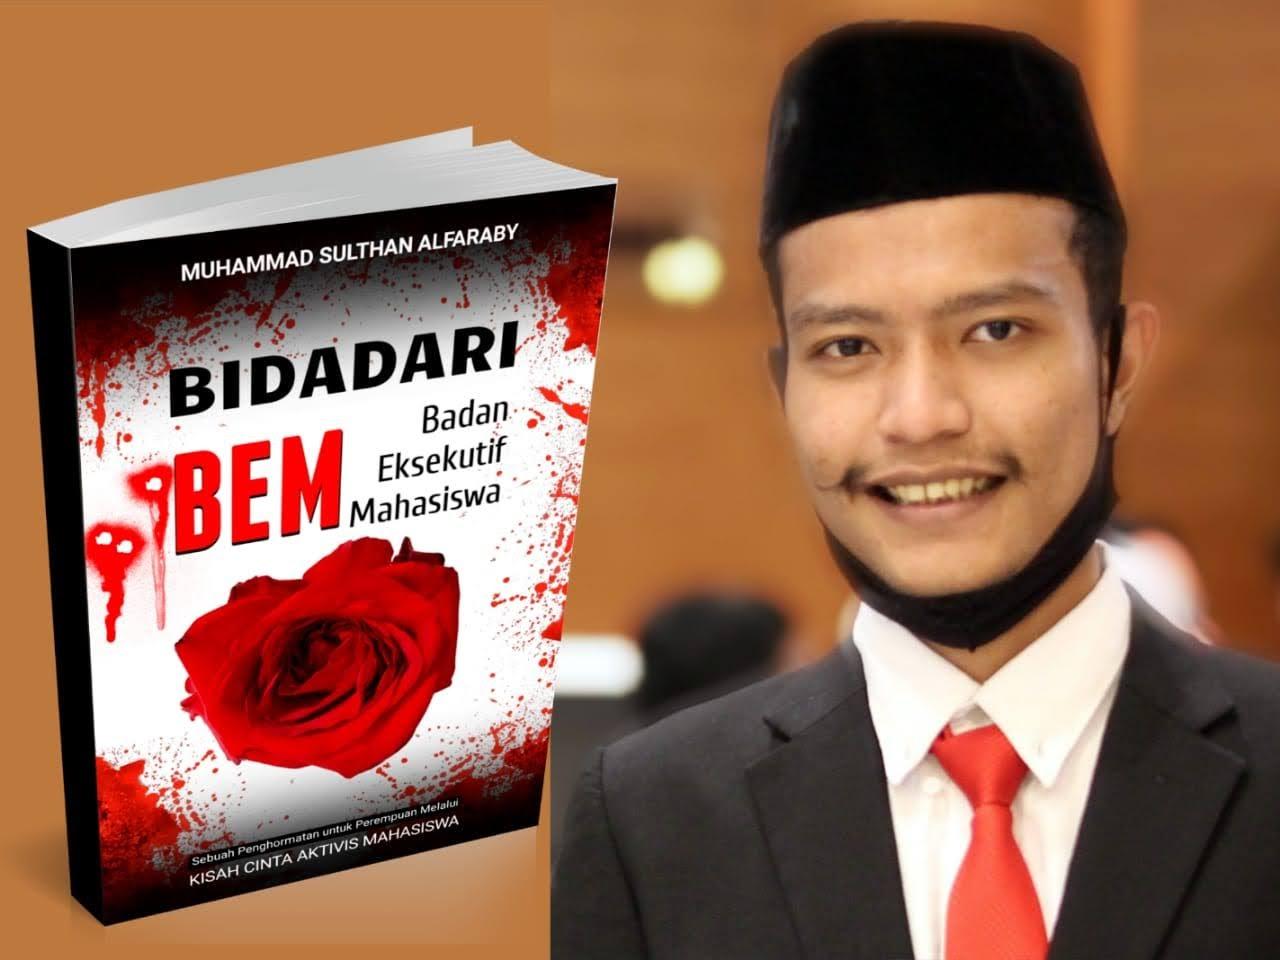 Aktivis Aceh Ciptakan Buku Lagi, Nama Presiden dan Jenderal Ikut Dibawa-Bawa